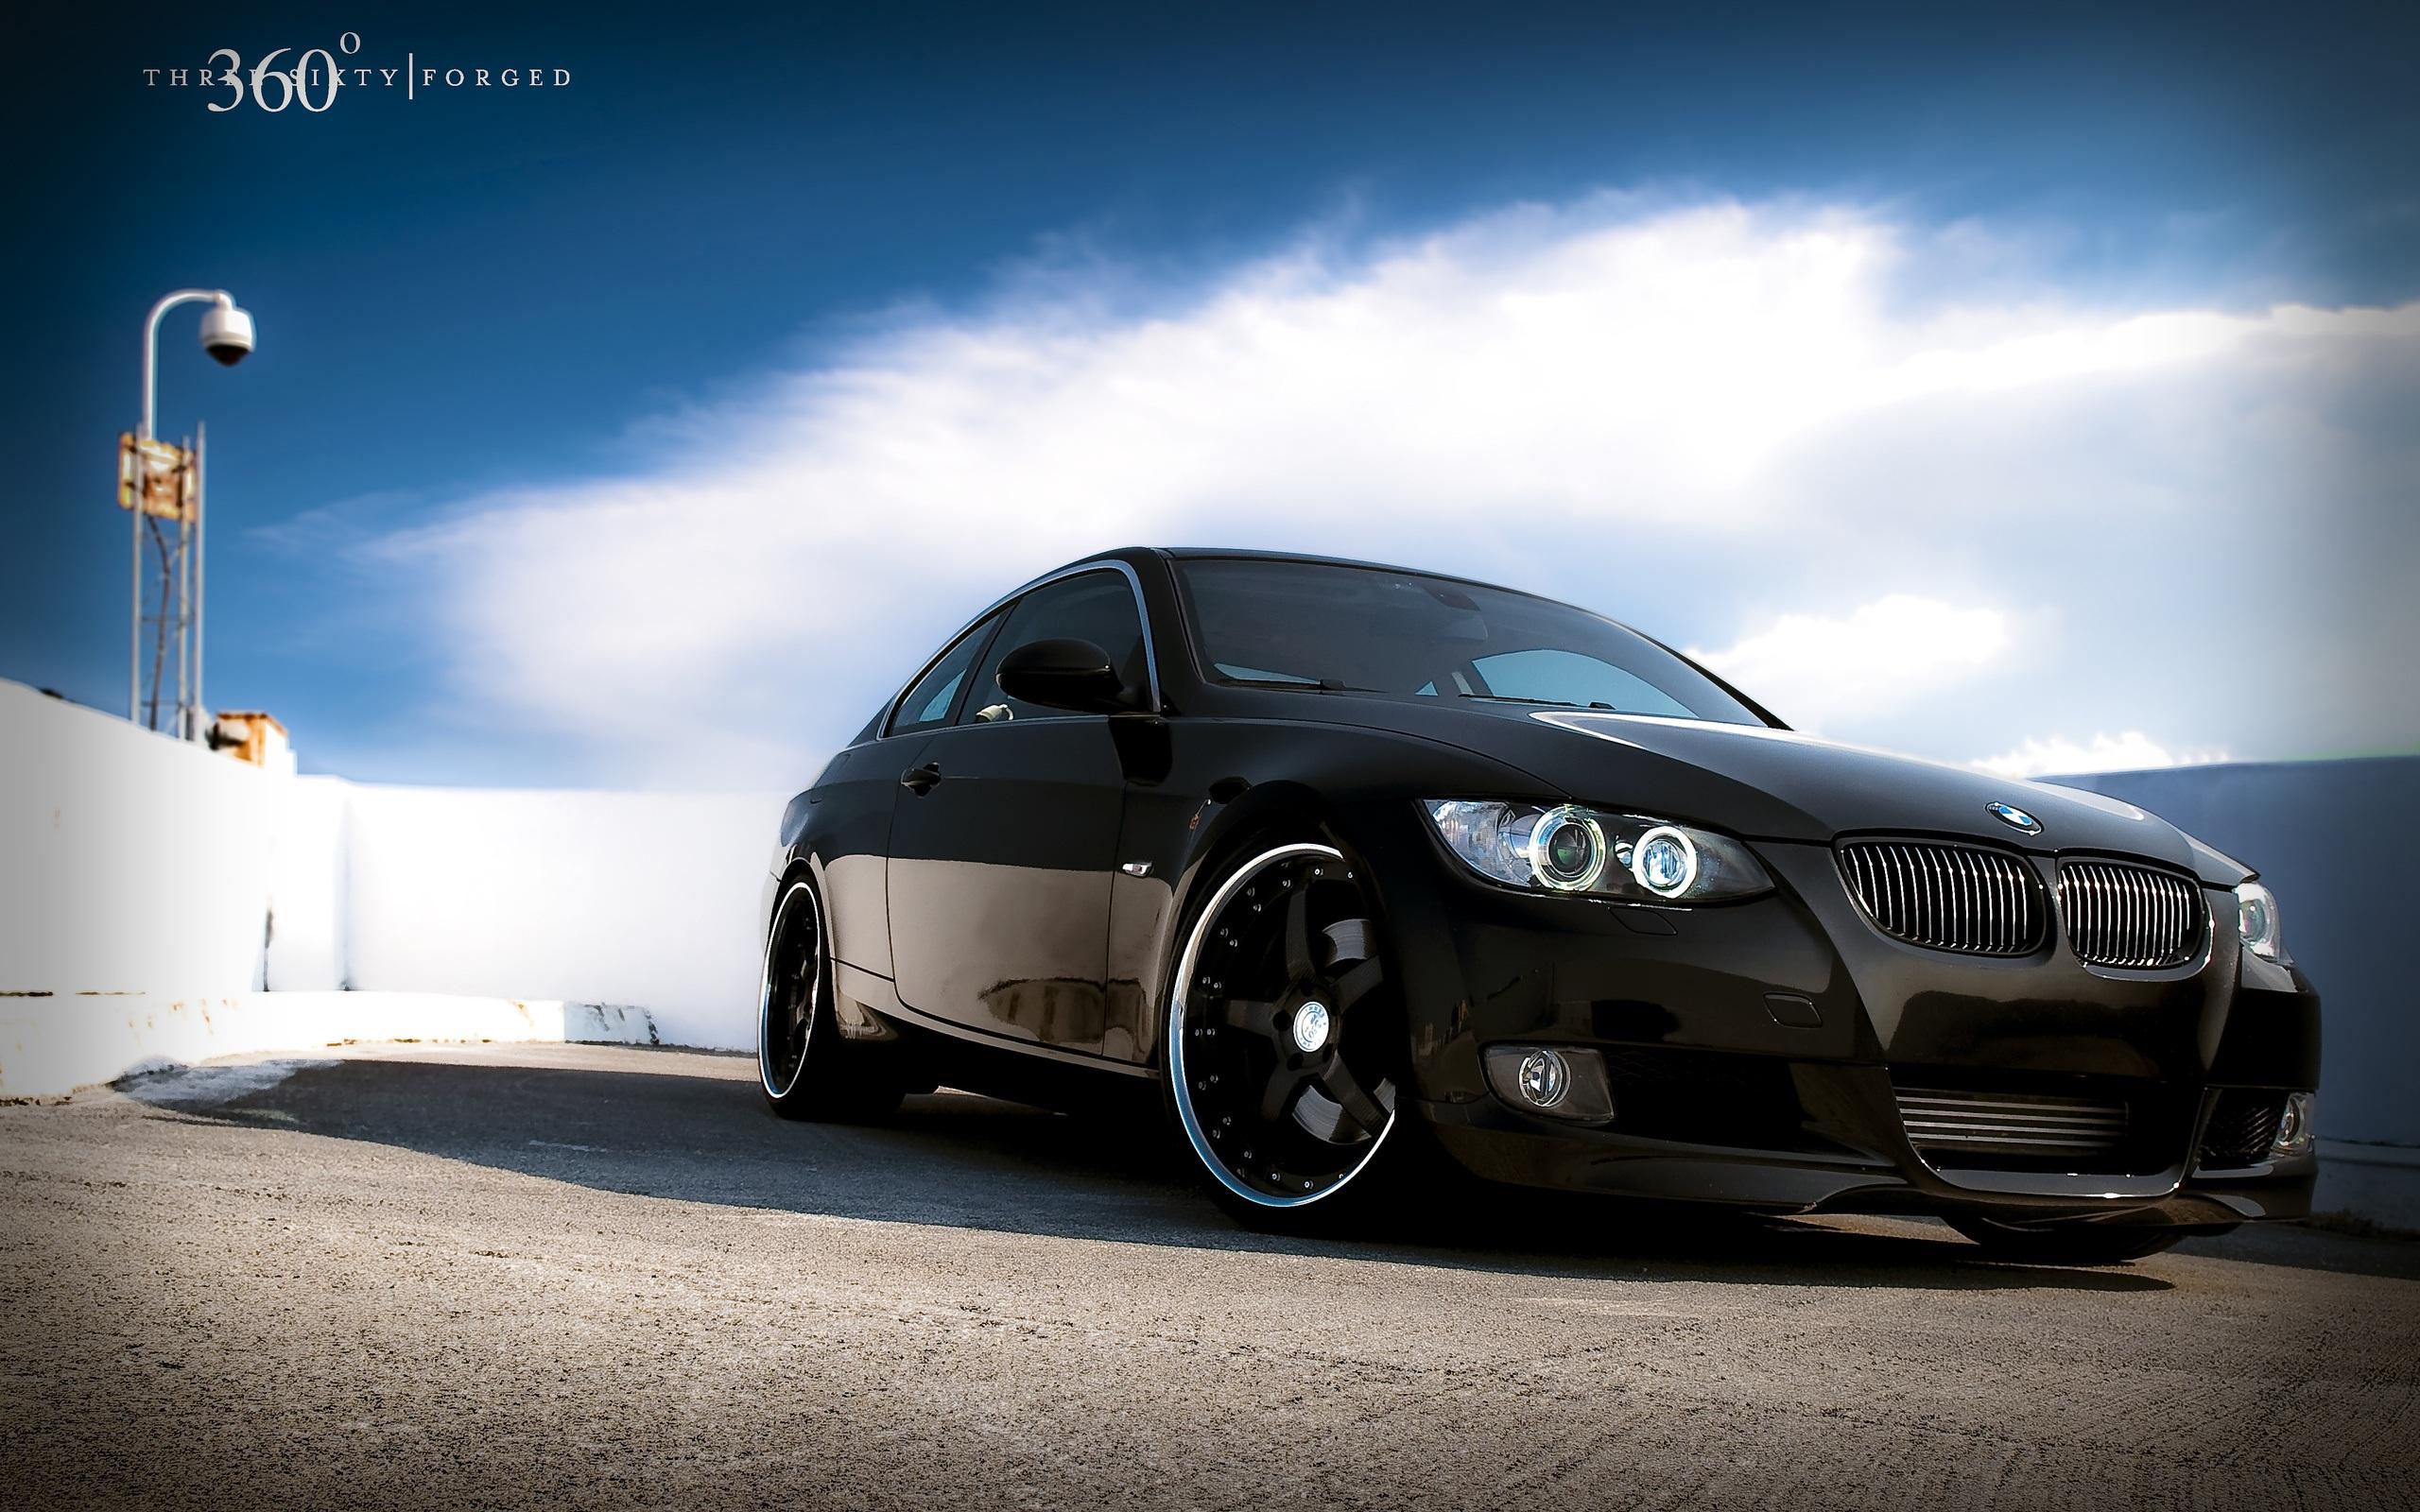 Bmw Car Black Color Wallpaper 2560x1600 Resolution